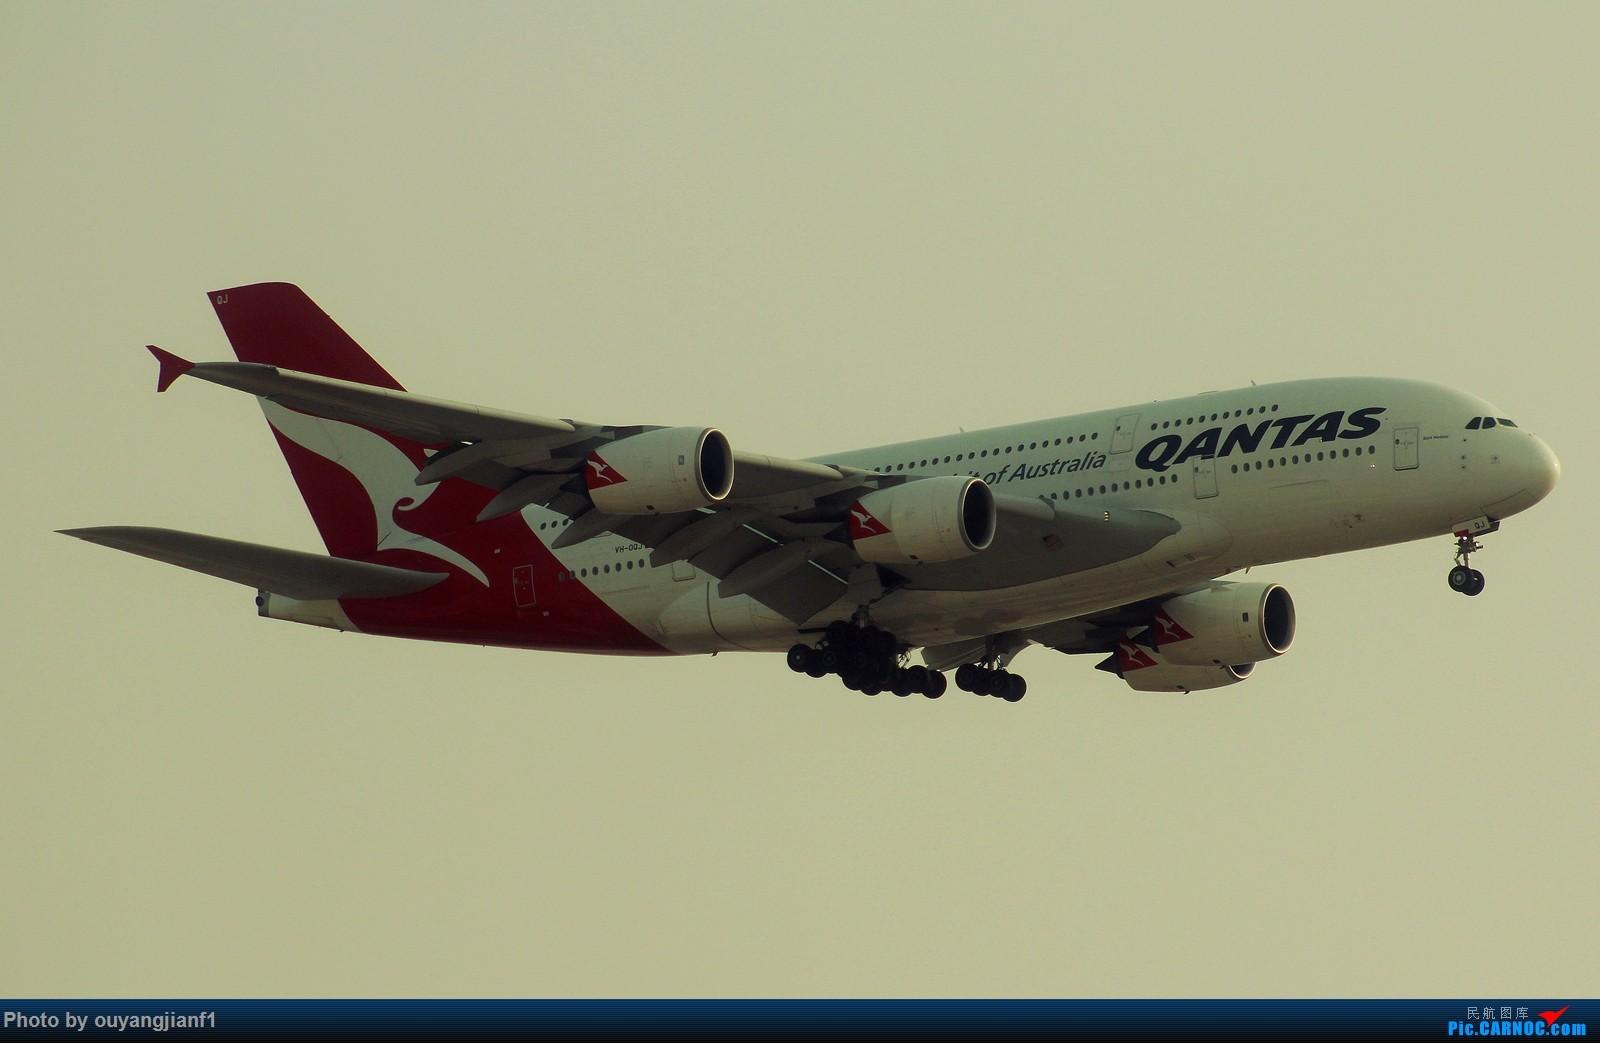 Re:[原创]很多年没有来贴图区了,记一次本不在计划中的迪拜拍机之行,在漫天黄沙中EK的380和777真的看到吐血.... AIRBUS A380-800 VH-OQJ 阿拉伯联合酋长国迪拜国际机场